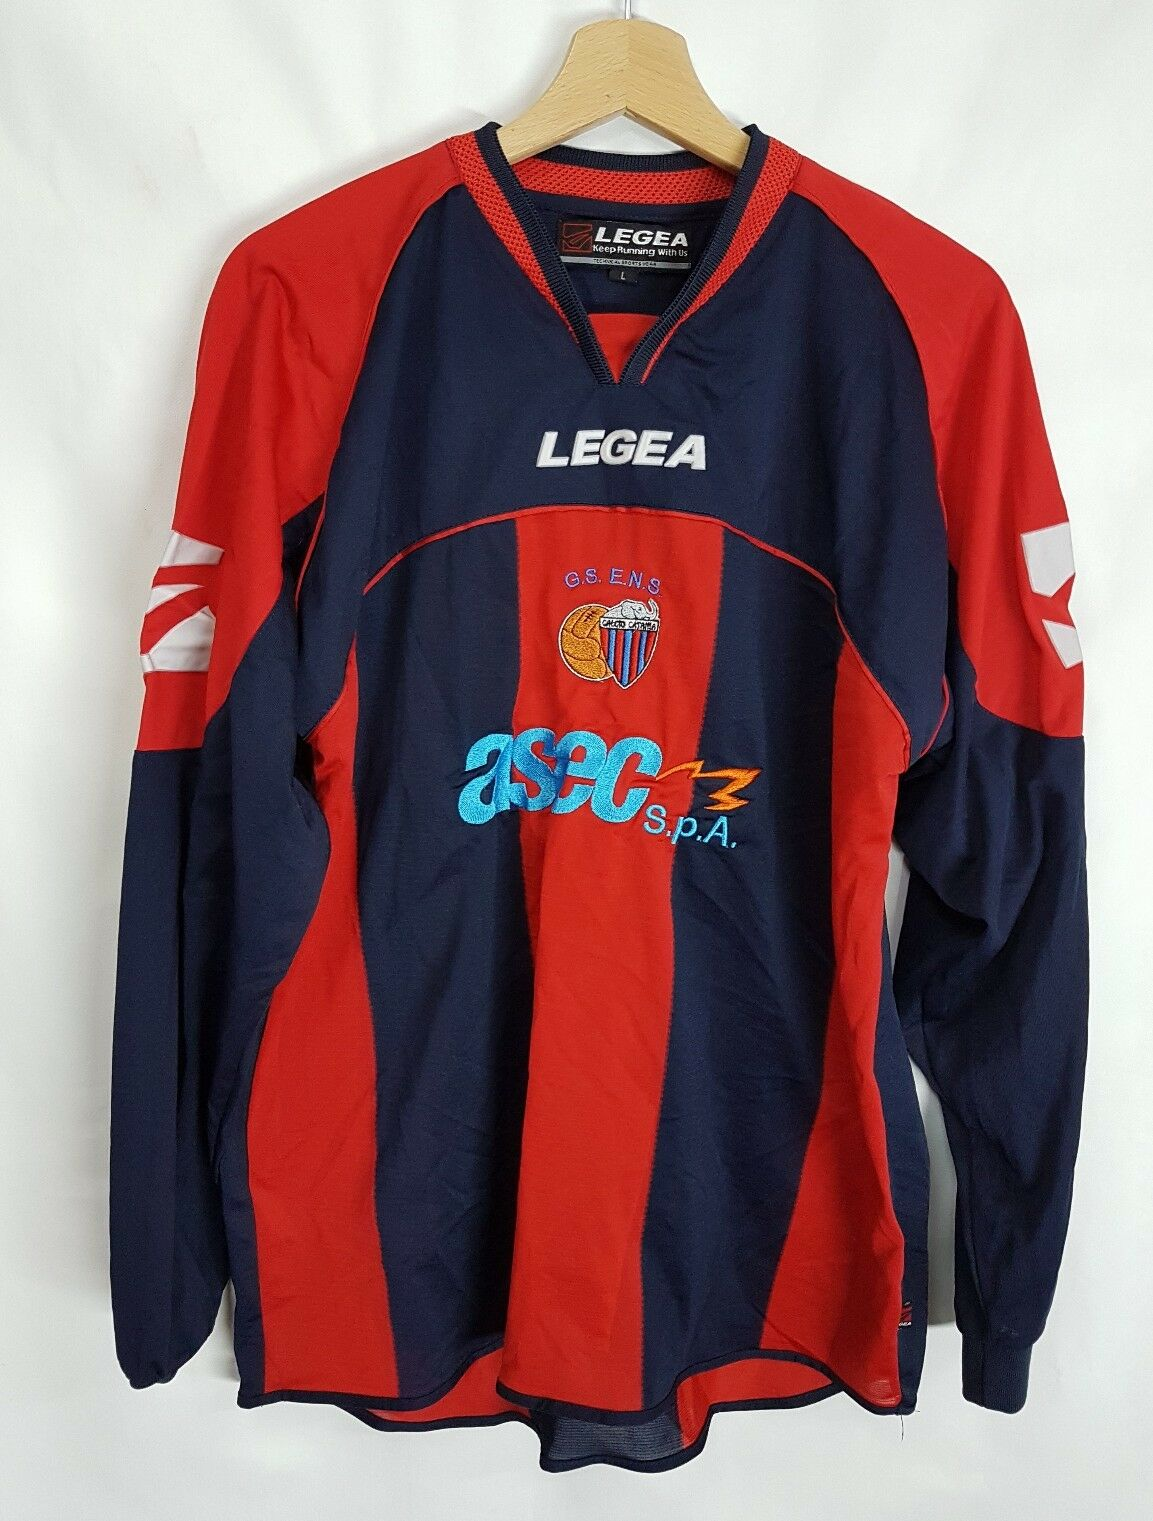 61a359813f7 Maglia calcio Legea Catania vintage 90 shirt camiseta soccer Legea Catania  N°19